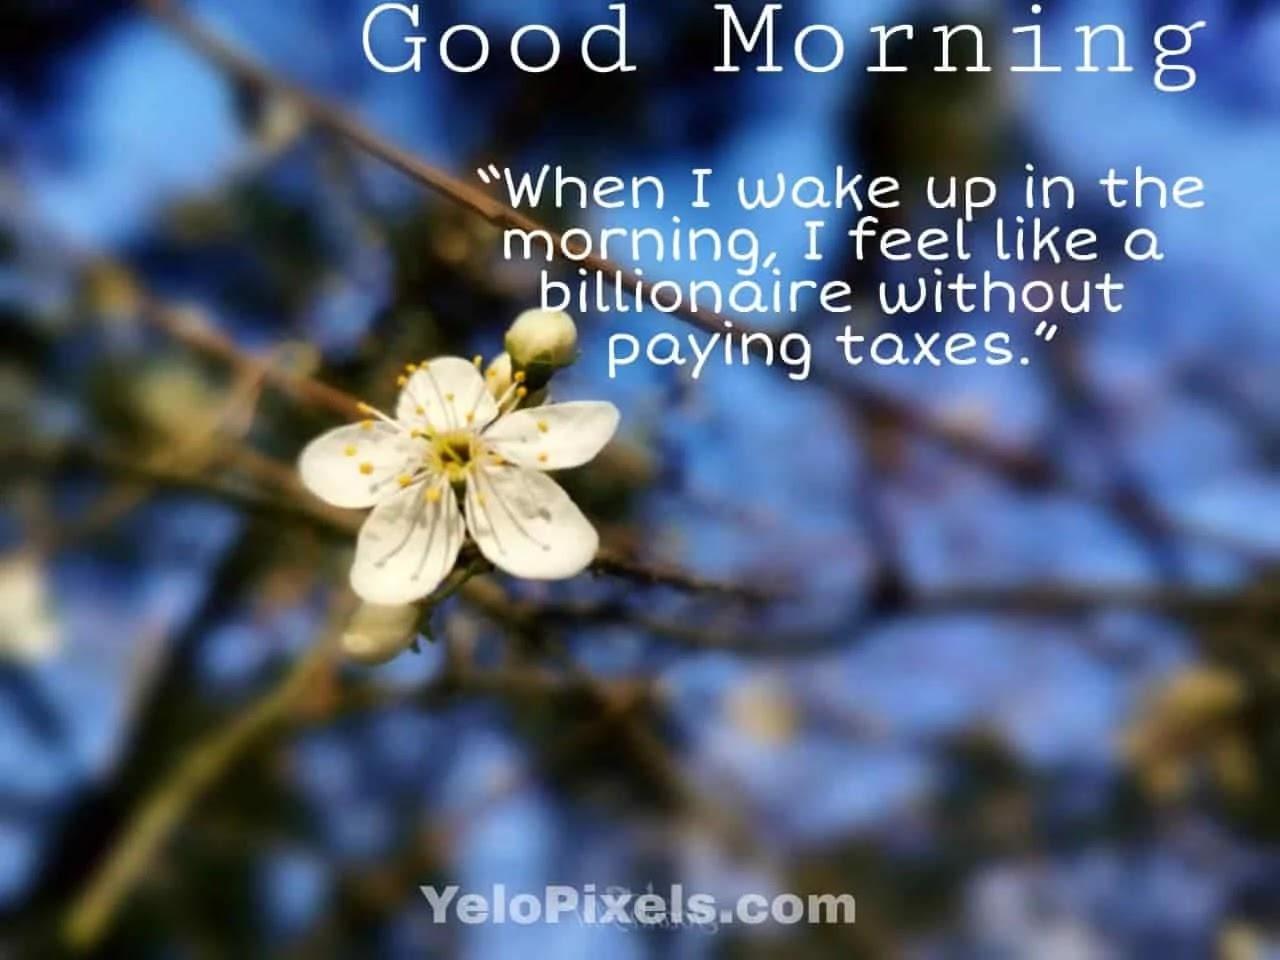 billionaire-wakeup-at-early-morning